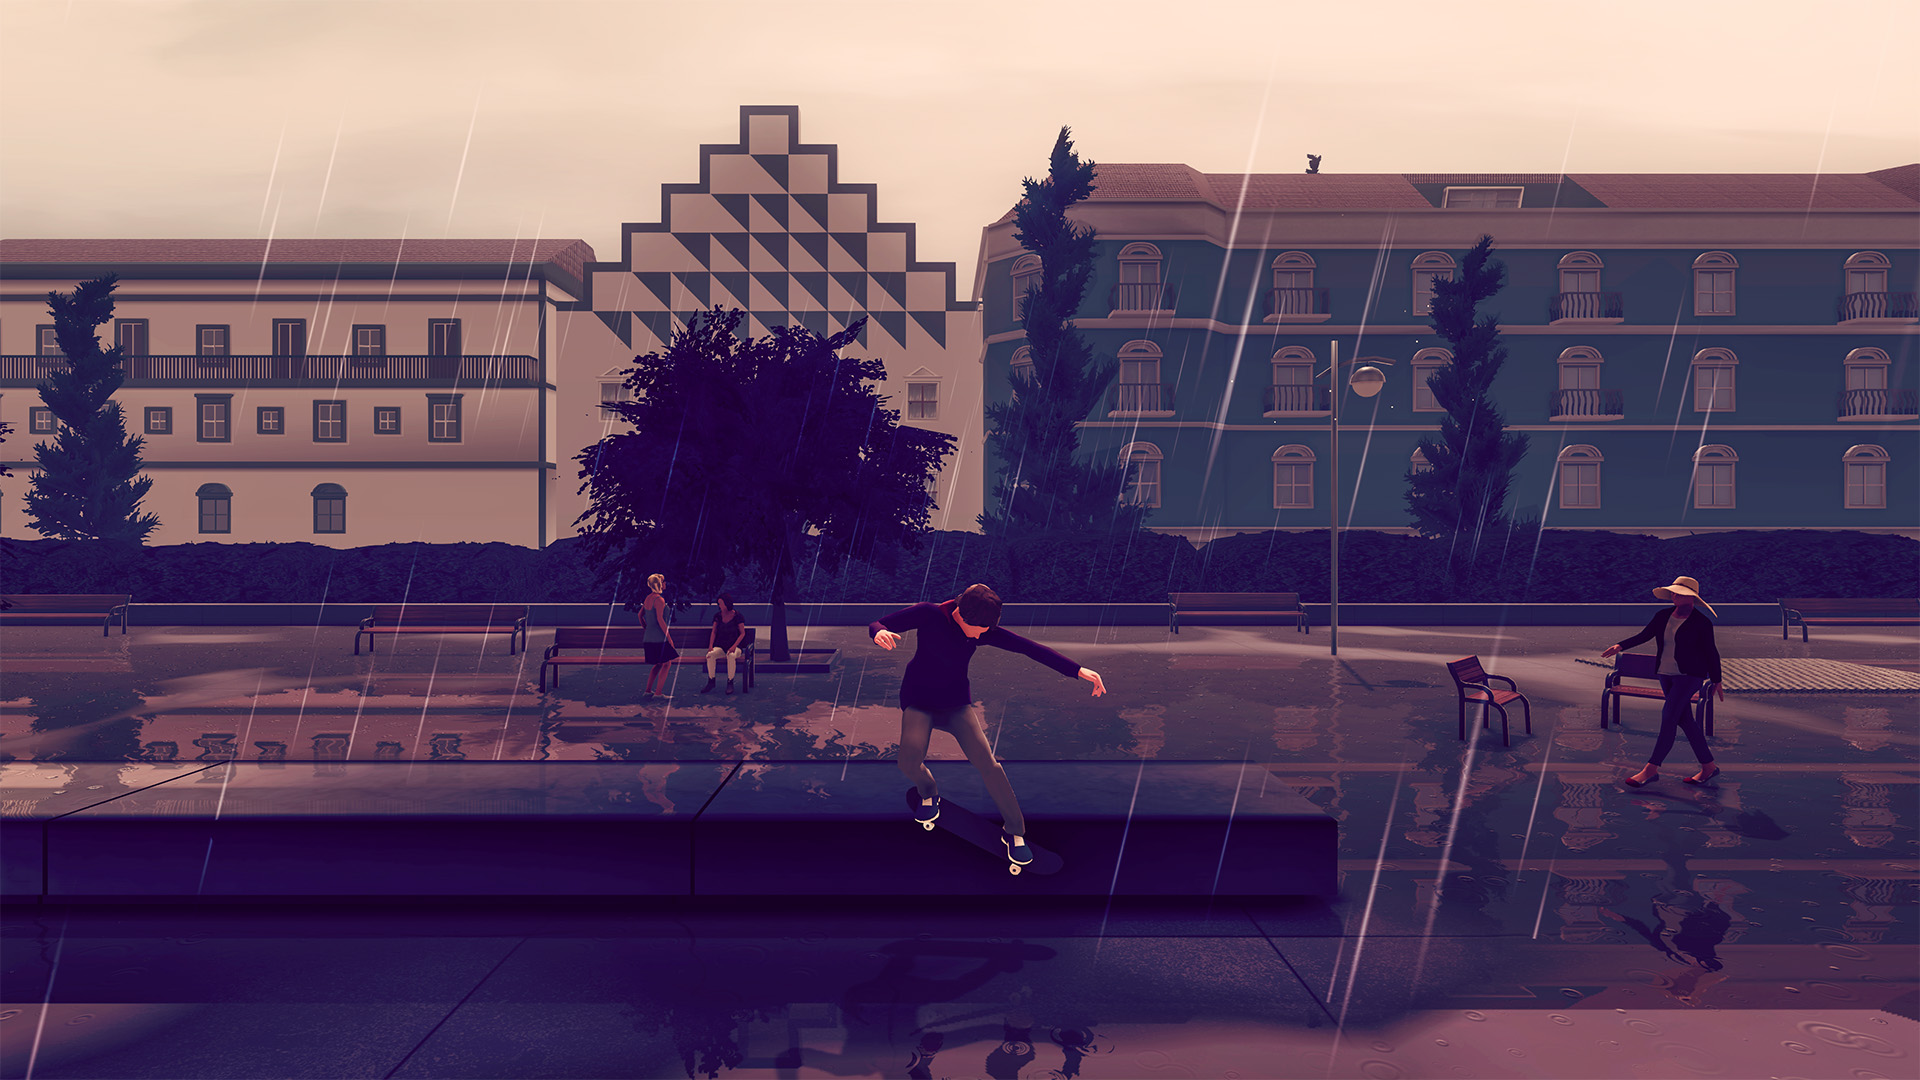 skate city game hd wallpaper 74323